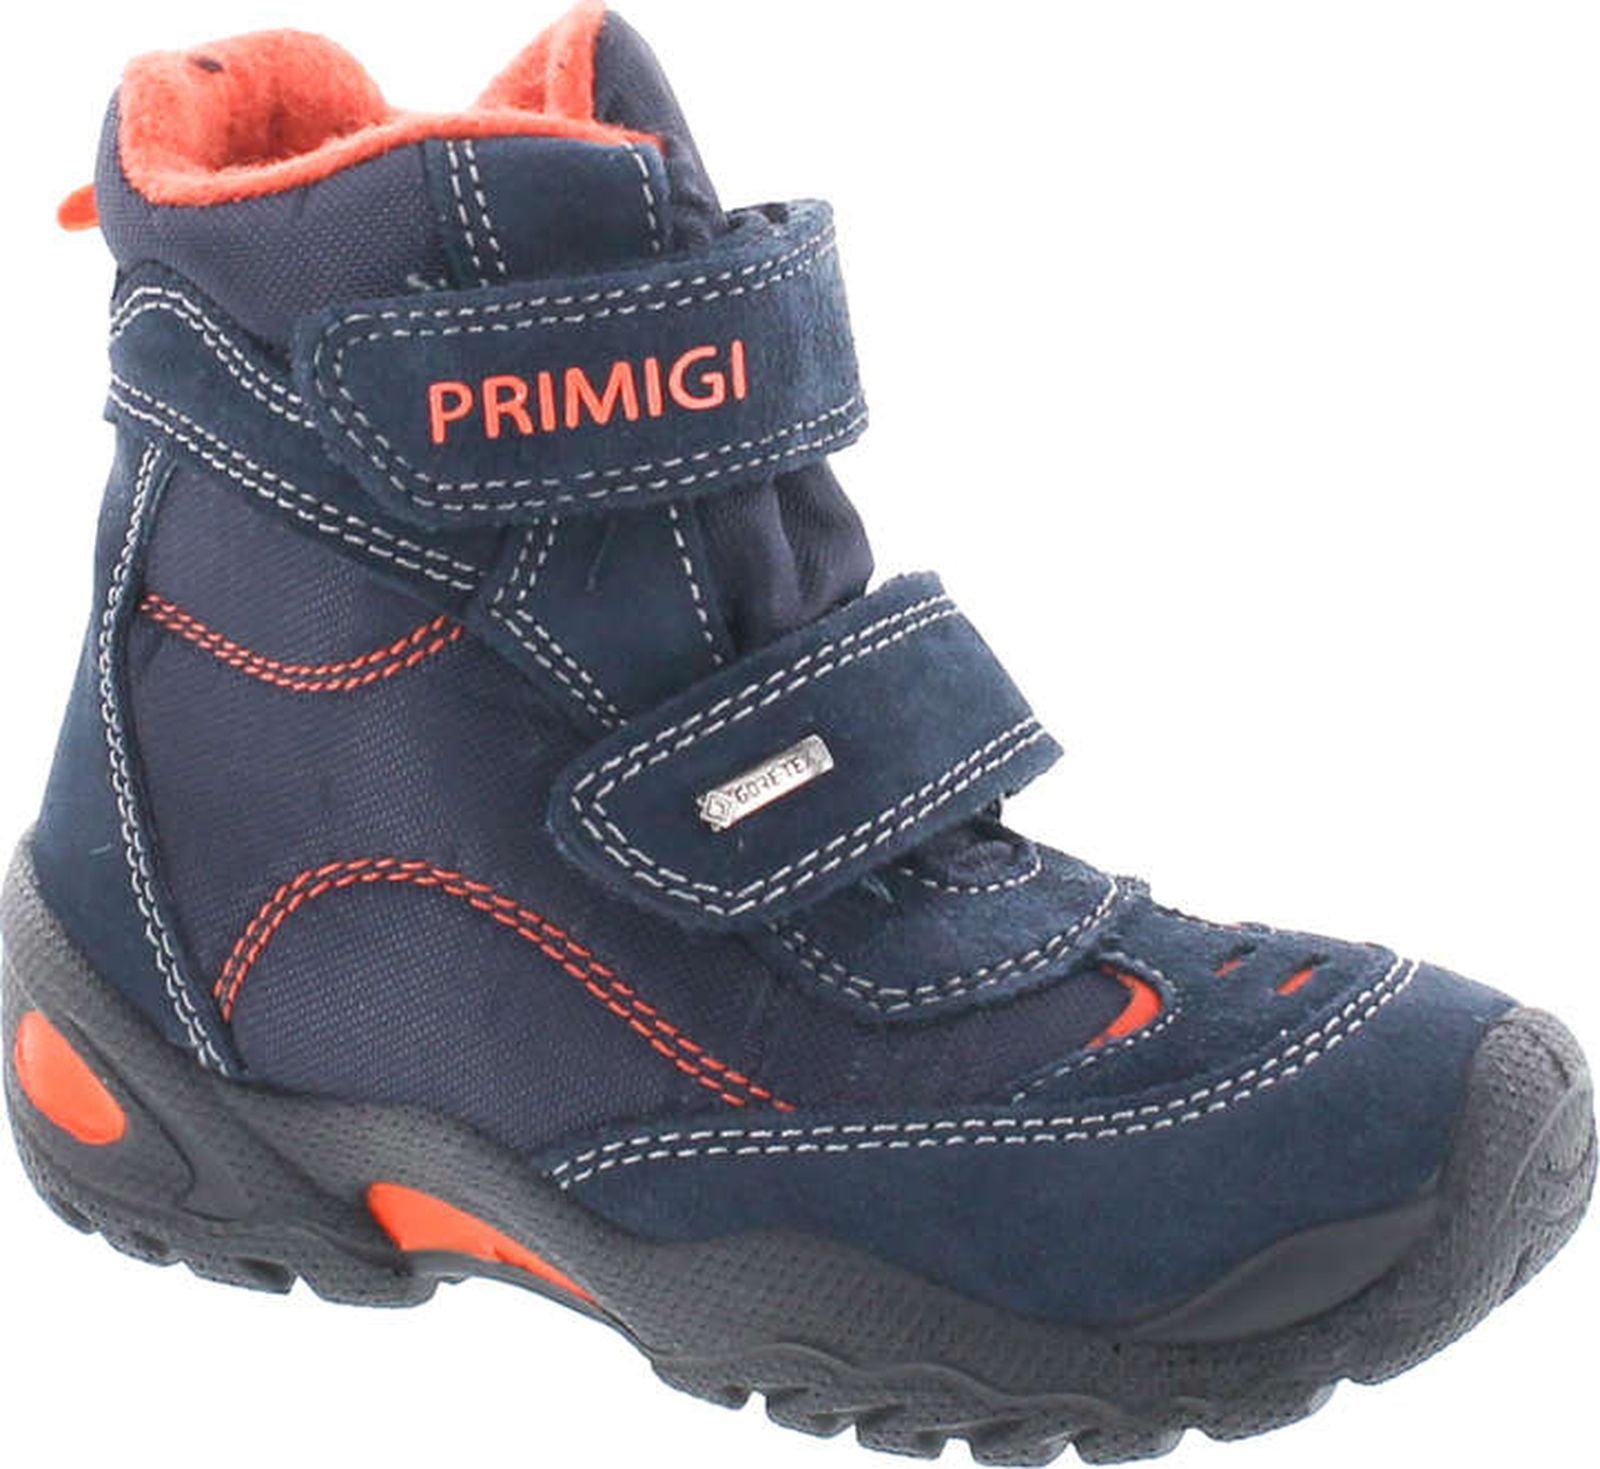 Primigi Boys 8645 Gore Tex Winter All Weatherproof Boots by Primigi